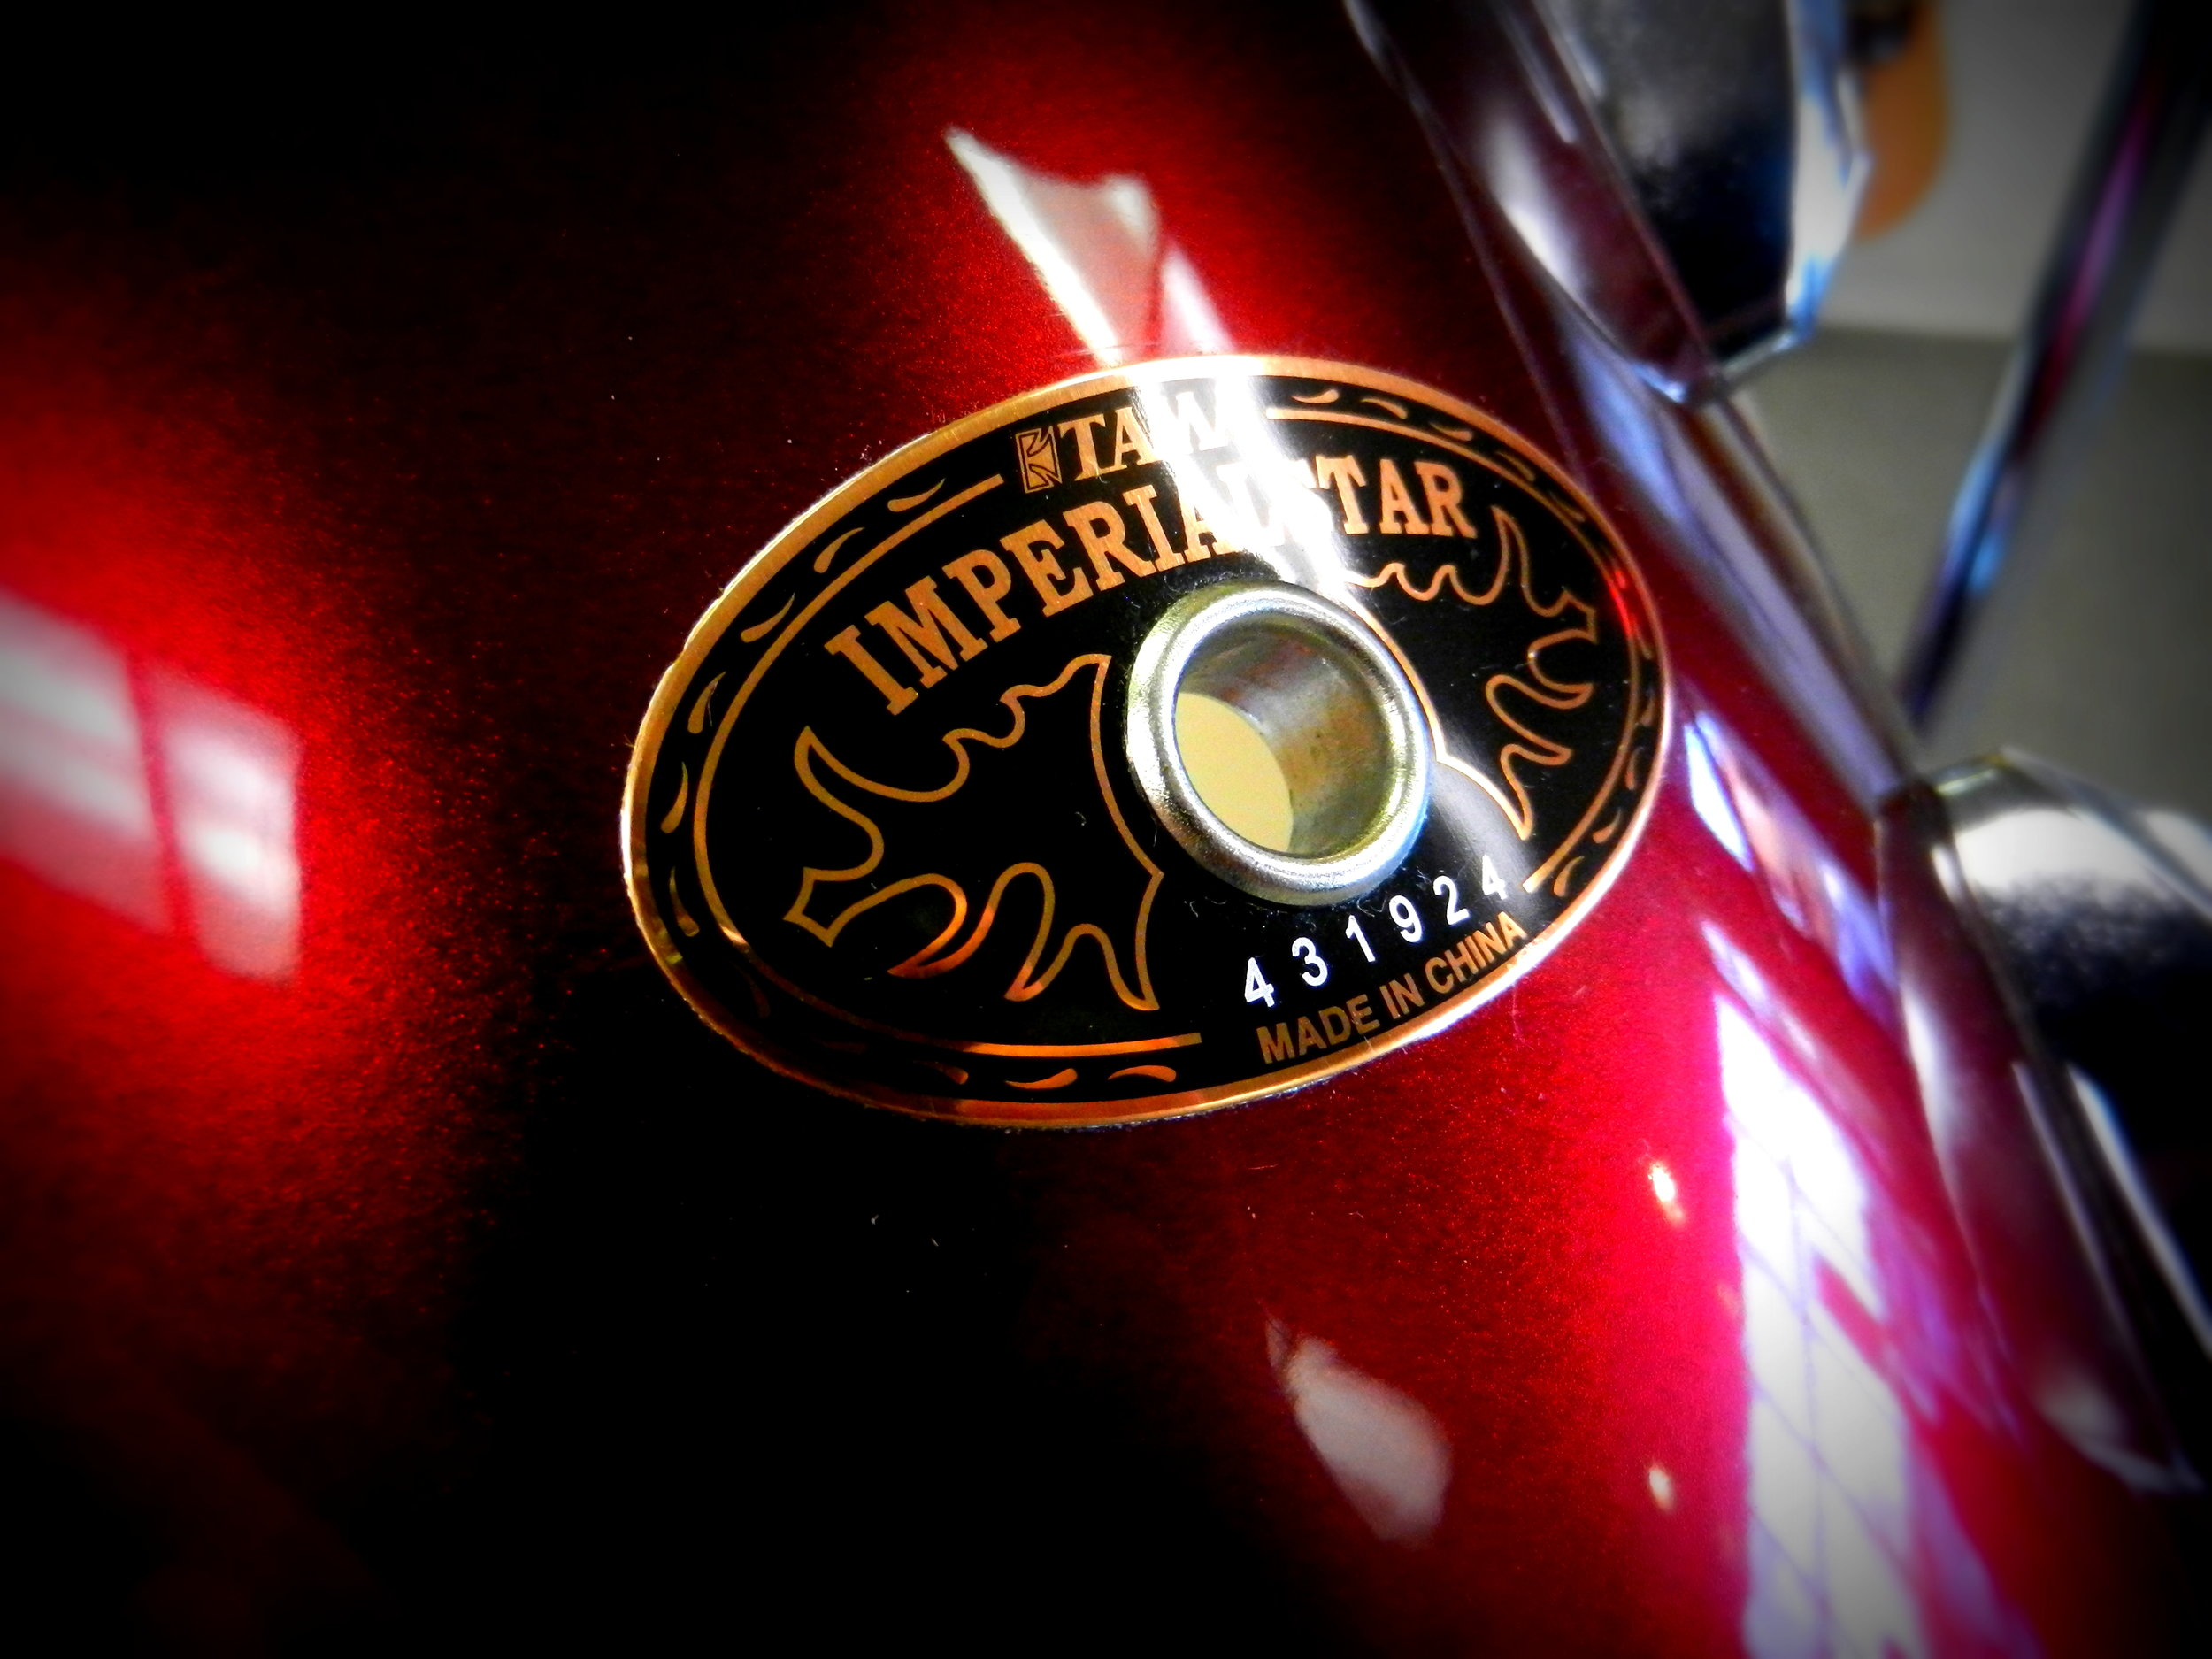 Used Tama Imperialstar Drum Set Badge.JPG